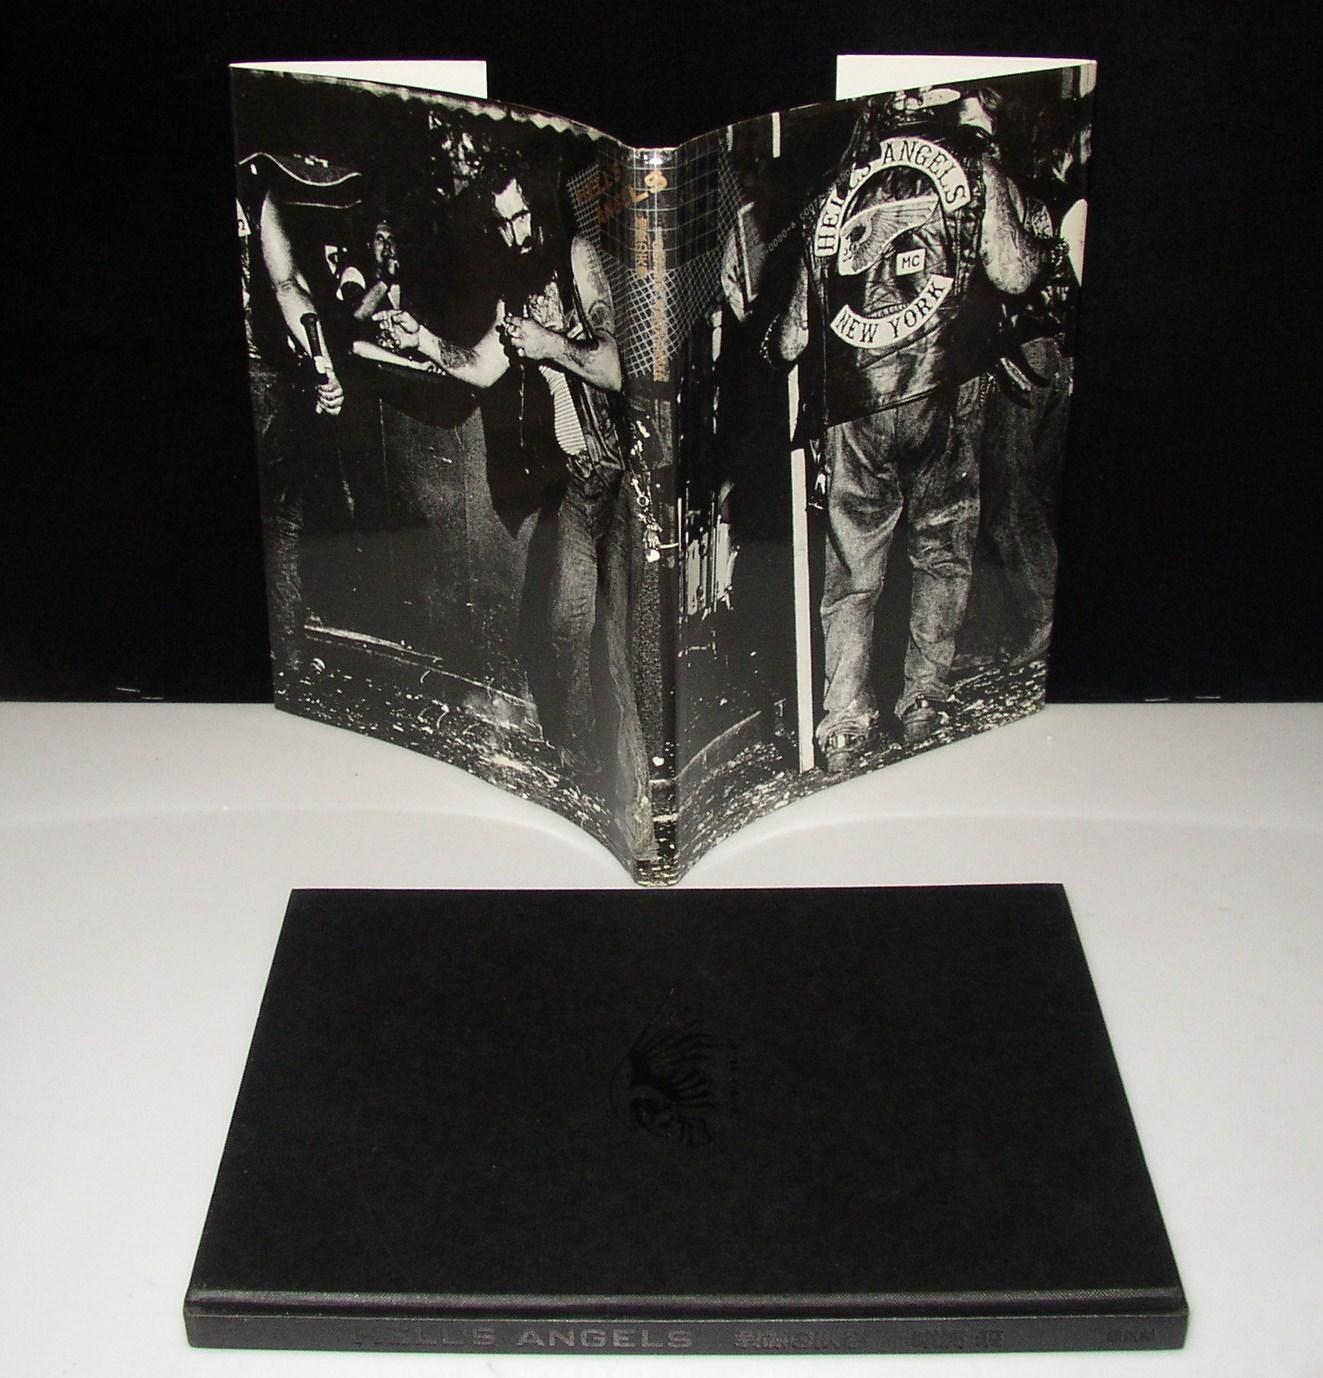 viaLibri ~ Hell's Angels 1968-1980 New York San Francisco